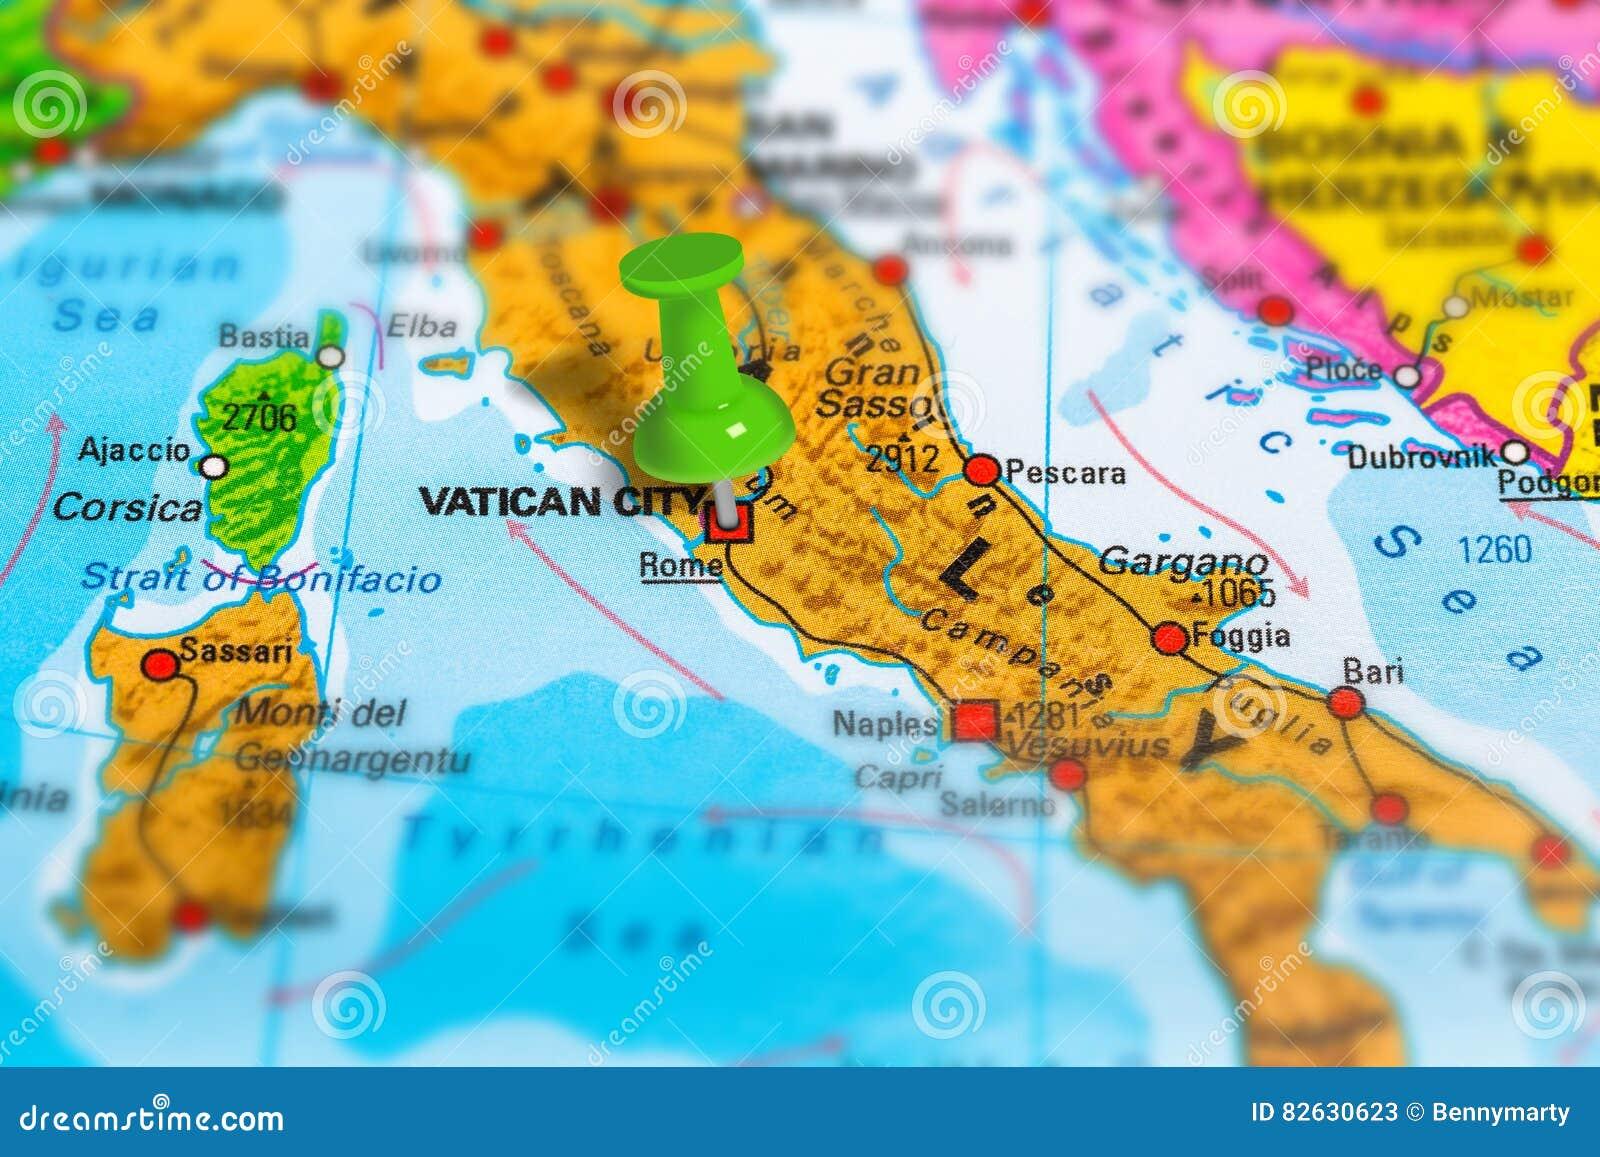 Rome Italy map stock image. Image of business, euro, macro - 82630623